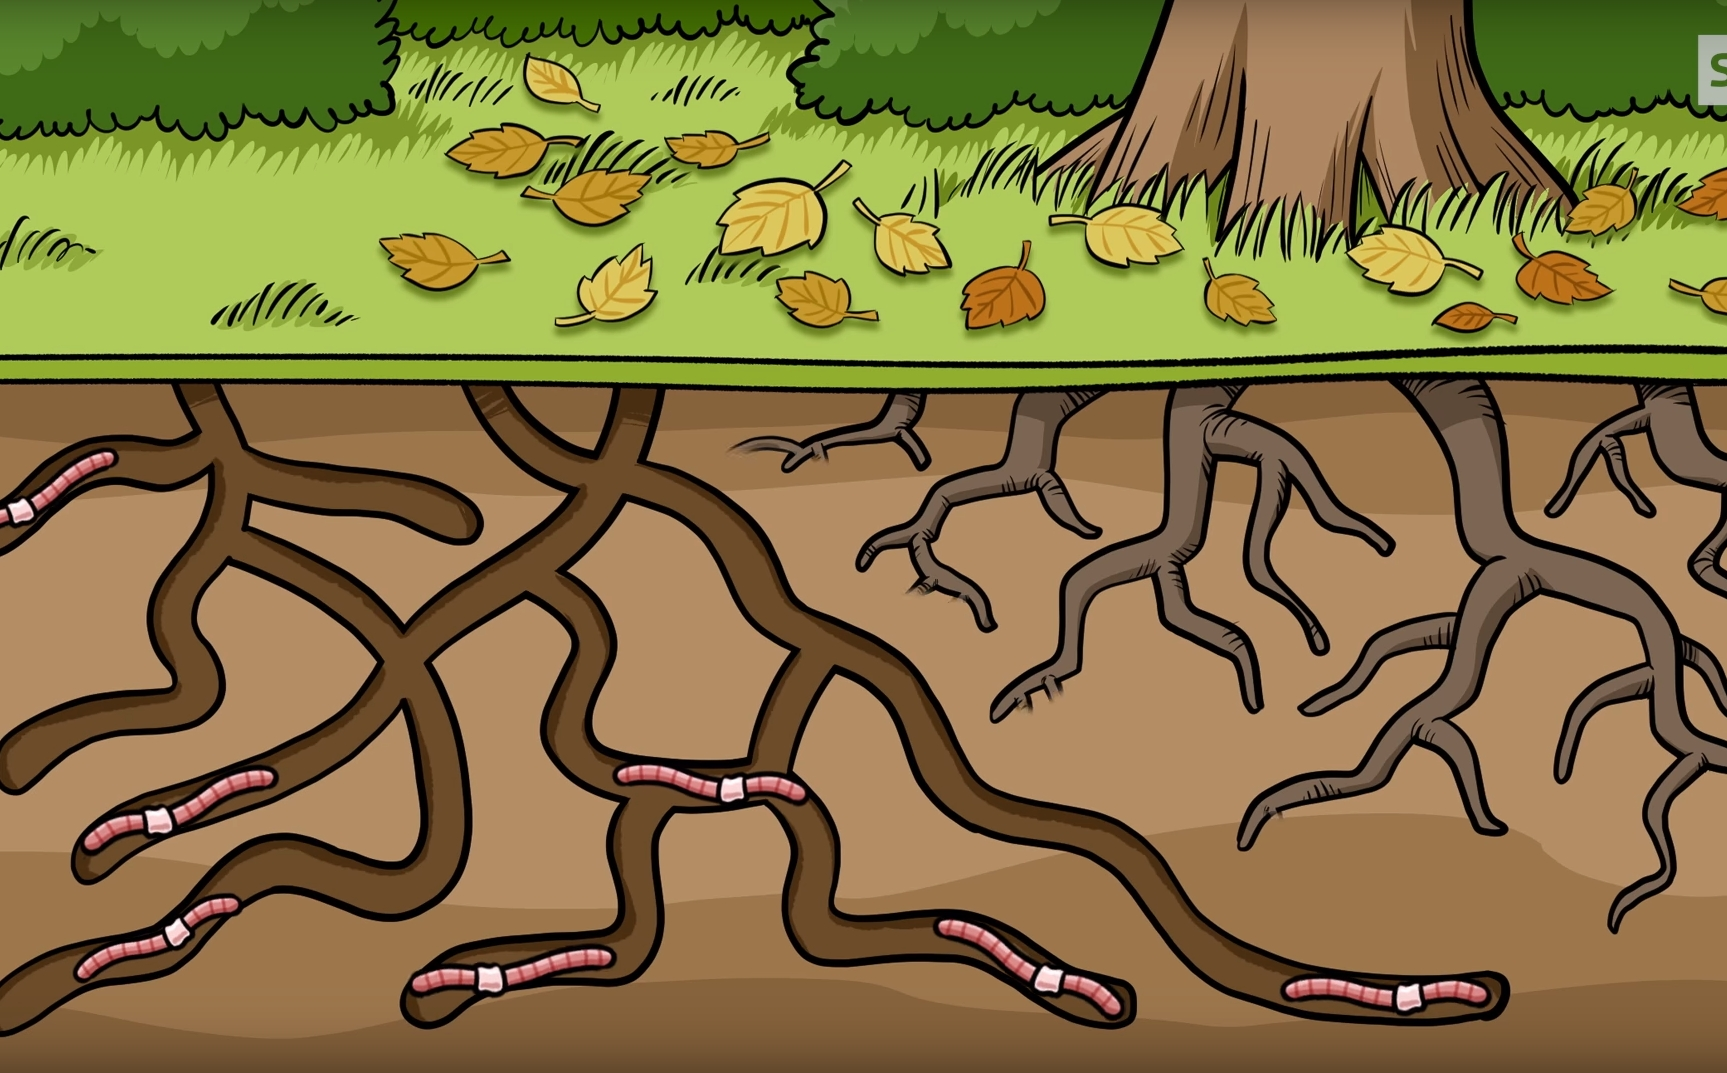 Preview image for LOM object Warum ist der Regenwurm so wichtig?